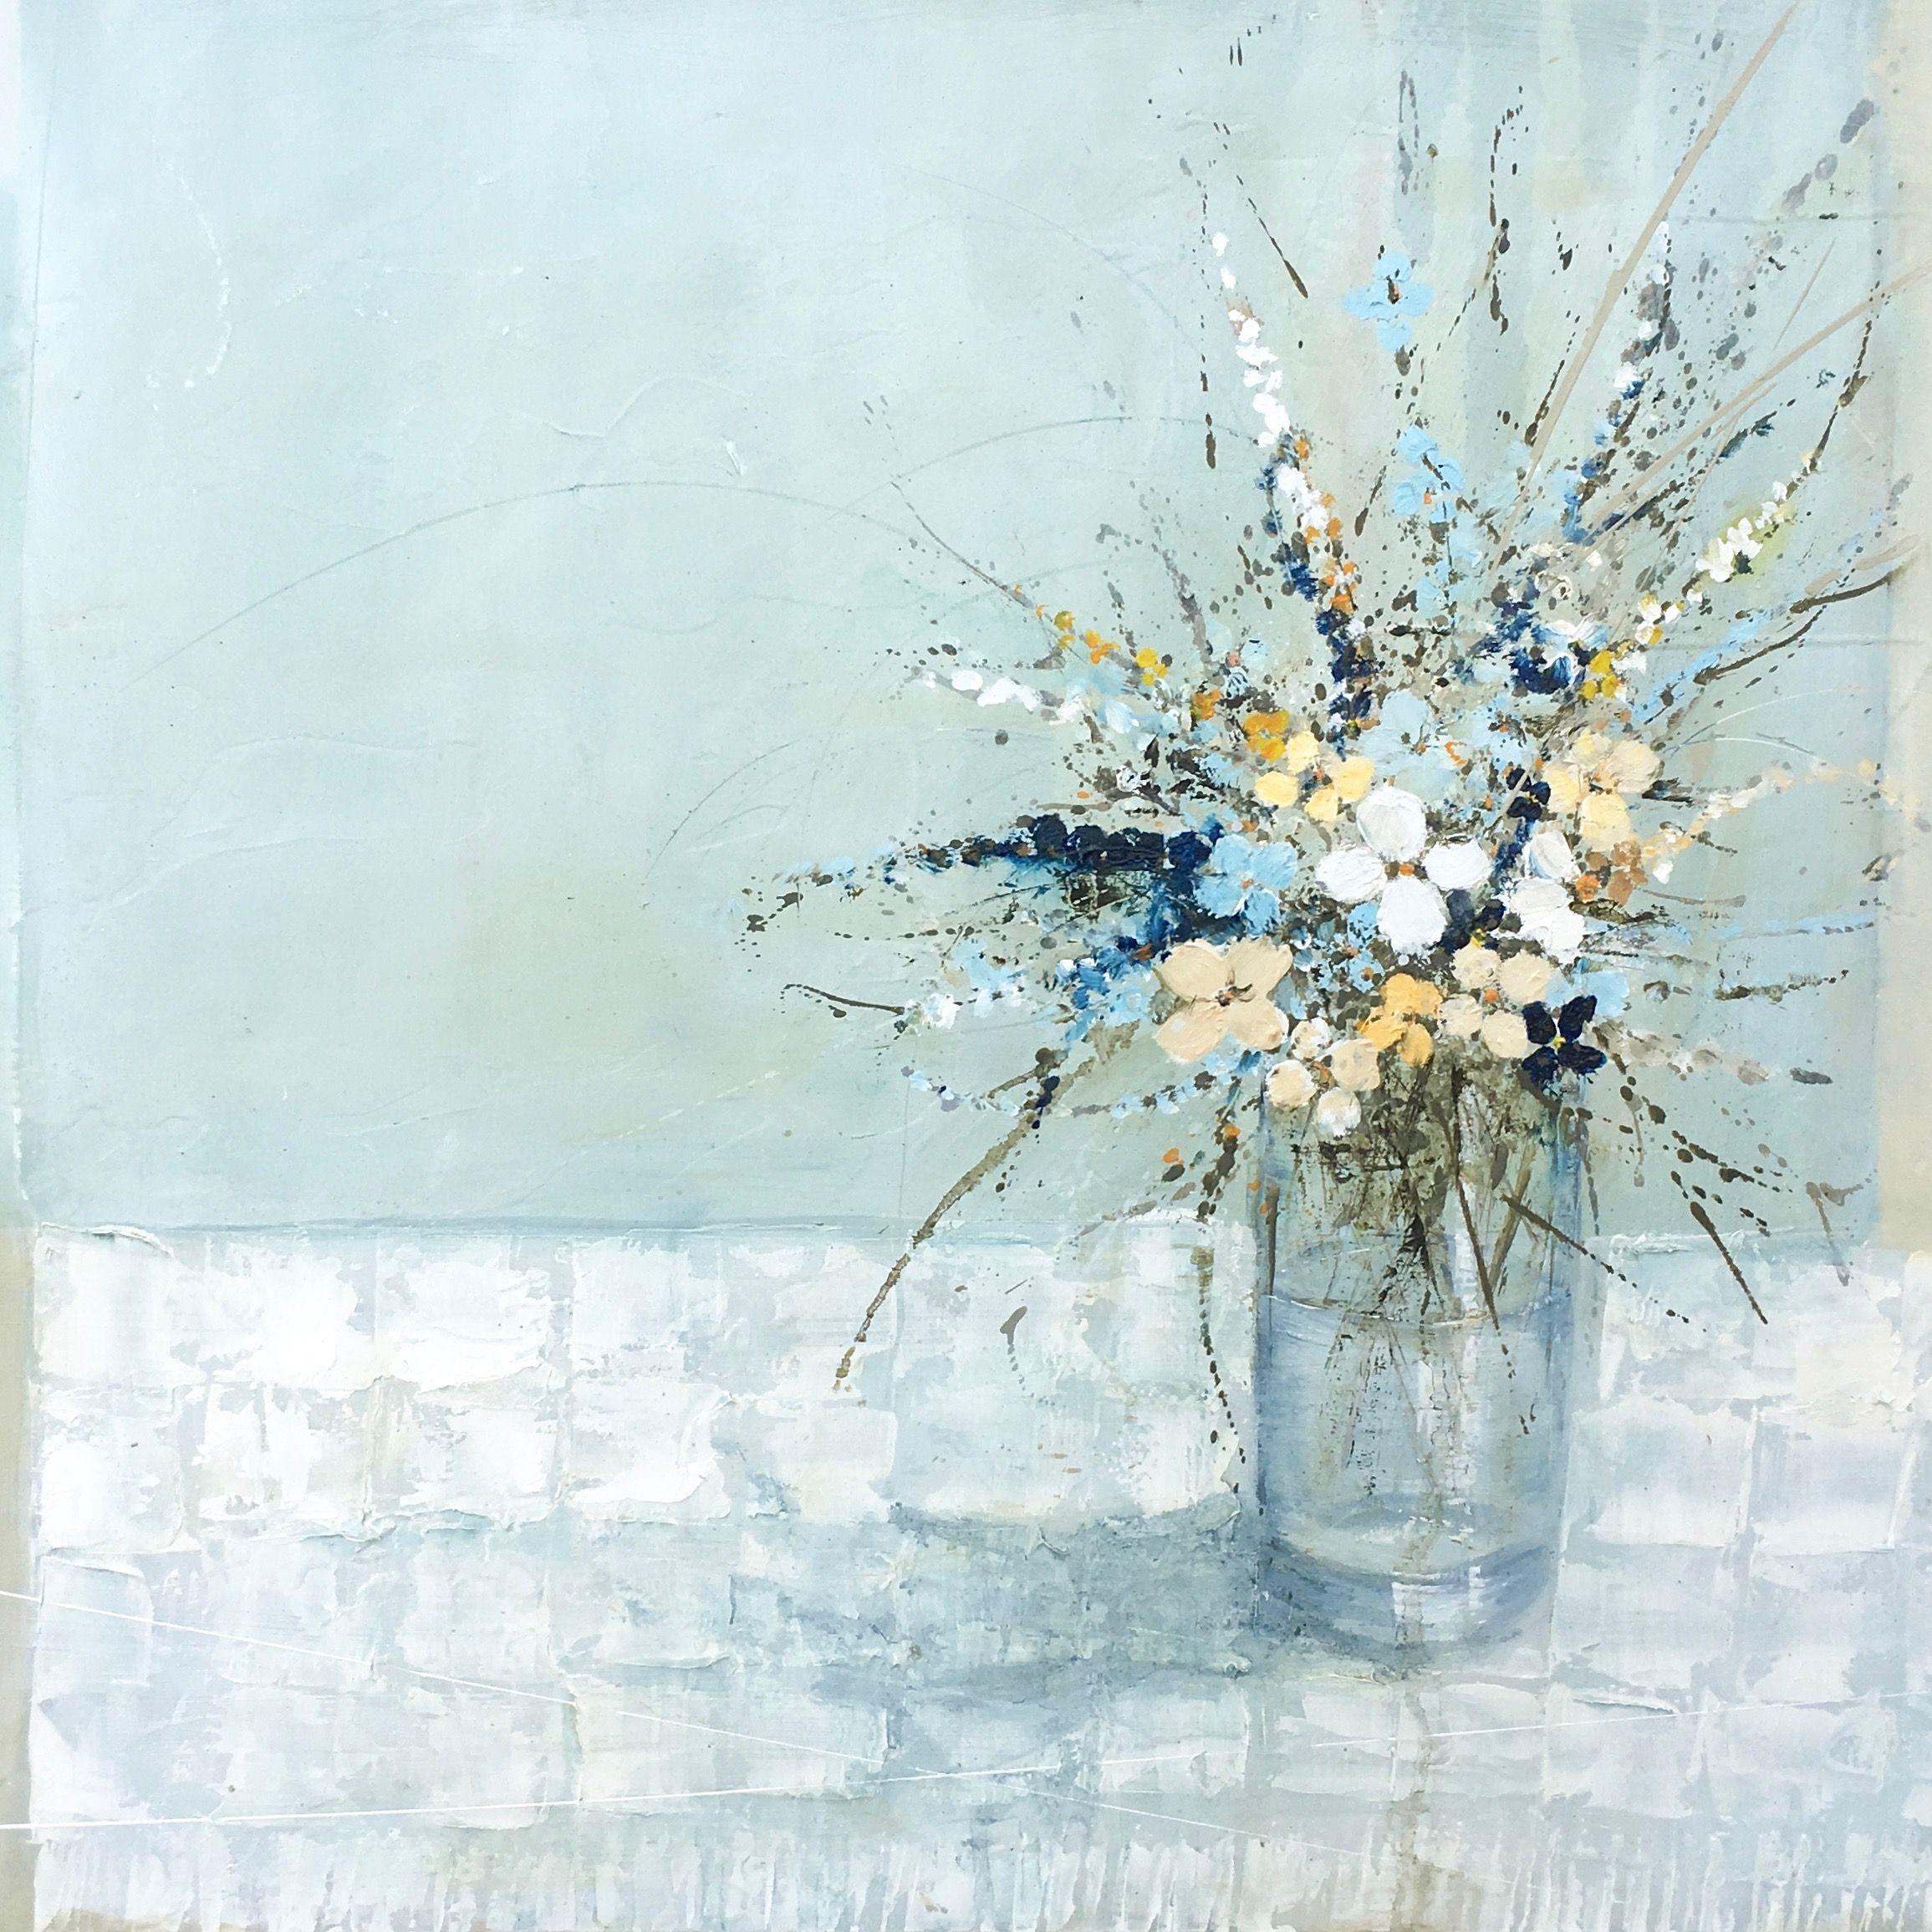 Картинки по запросу Jane Skingley Flowers on a Checked Cloth